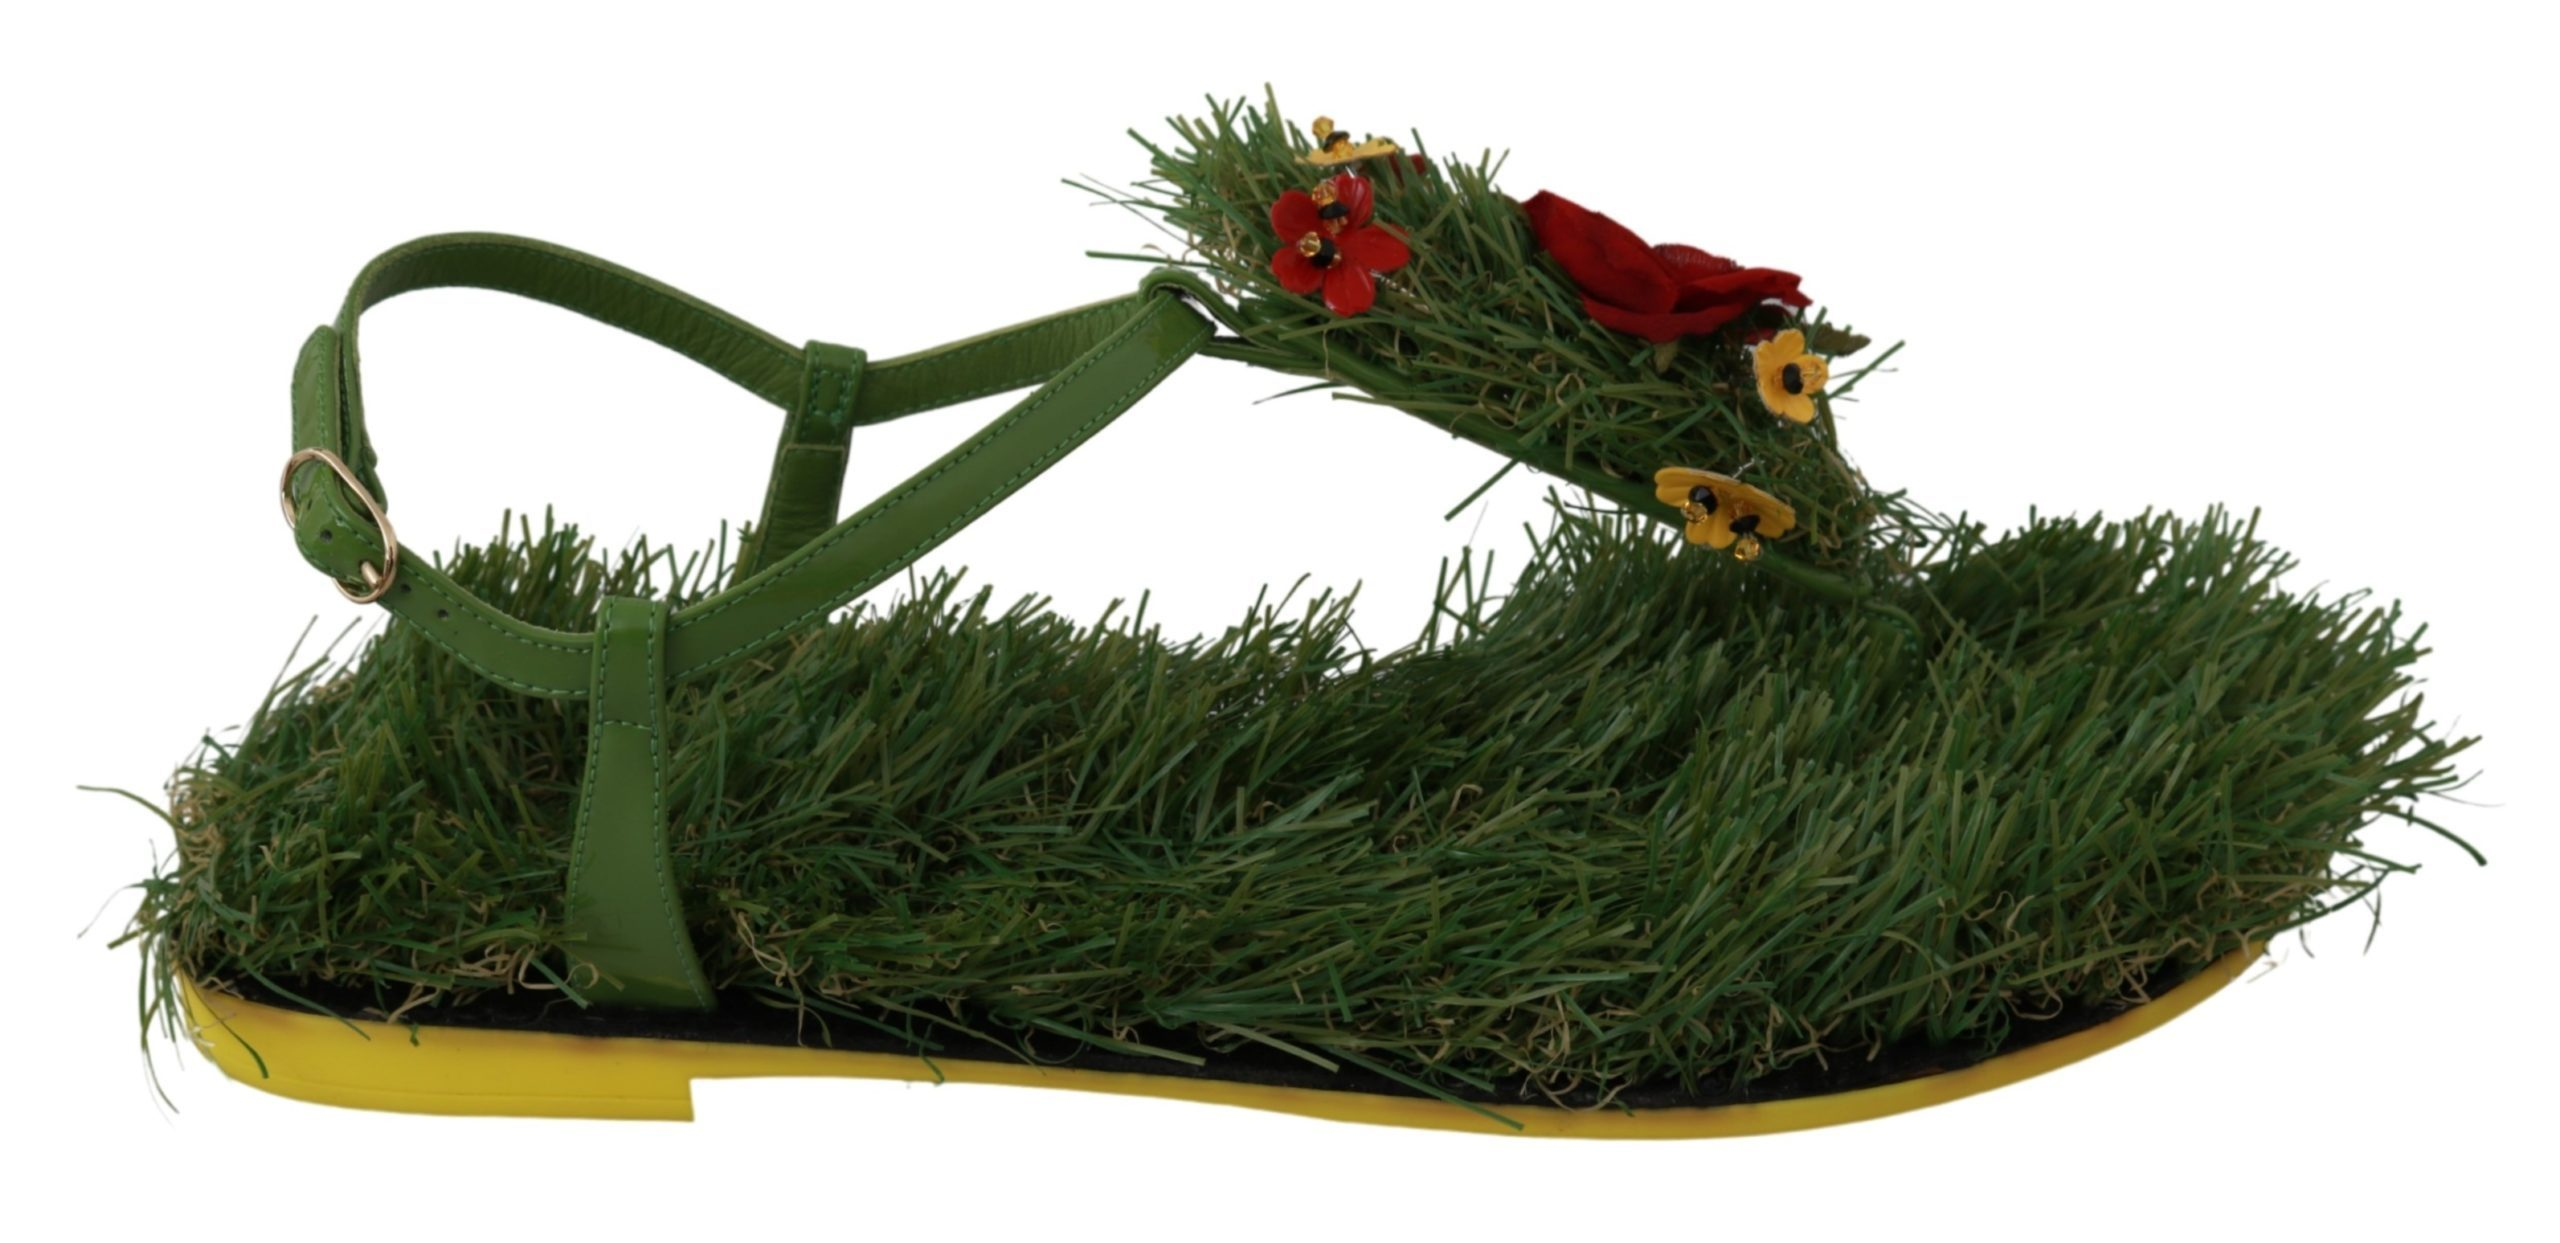 Dolce & Gabbana Women's Leather Grass Floral Sandals Green LA6462 - EU35/US4.5